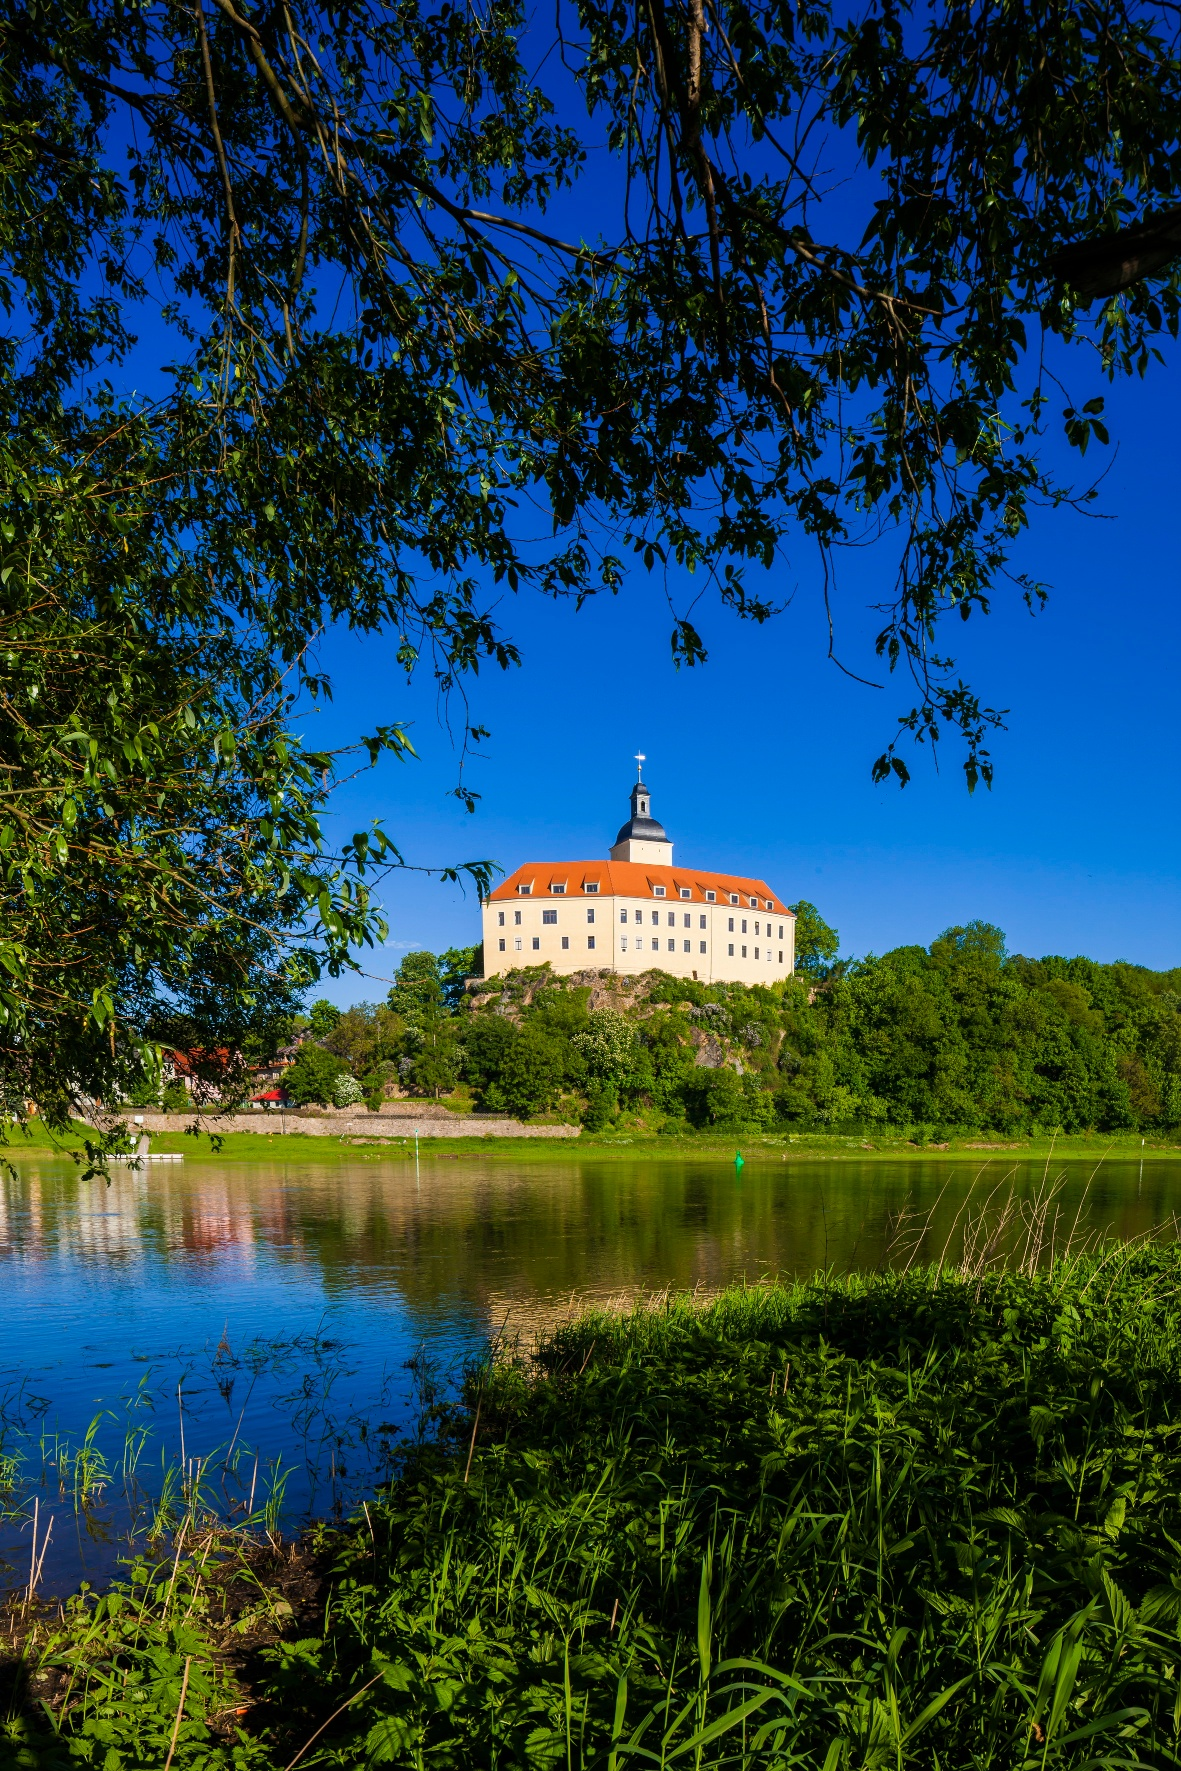 Schloss Hirschstein